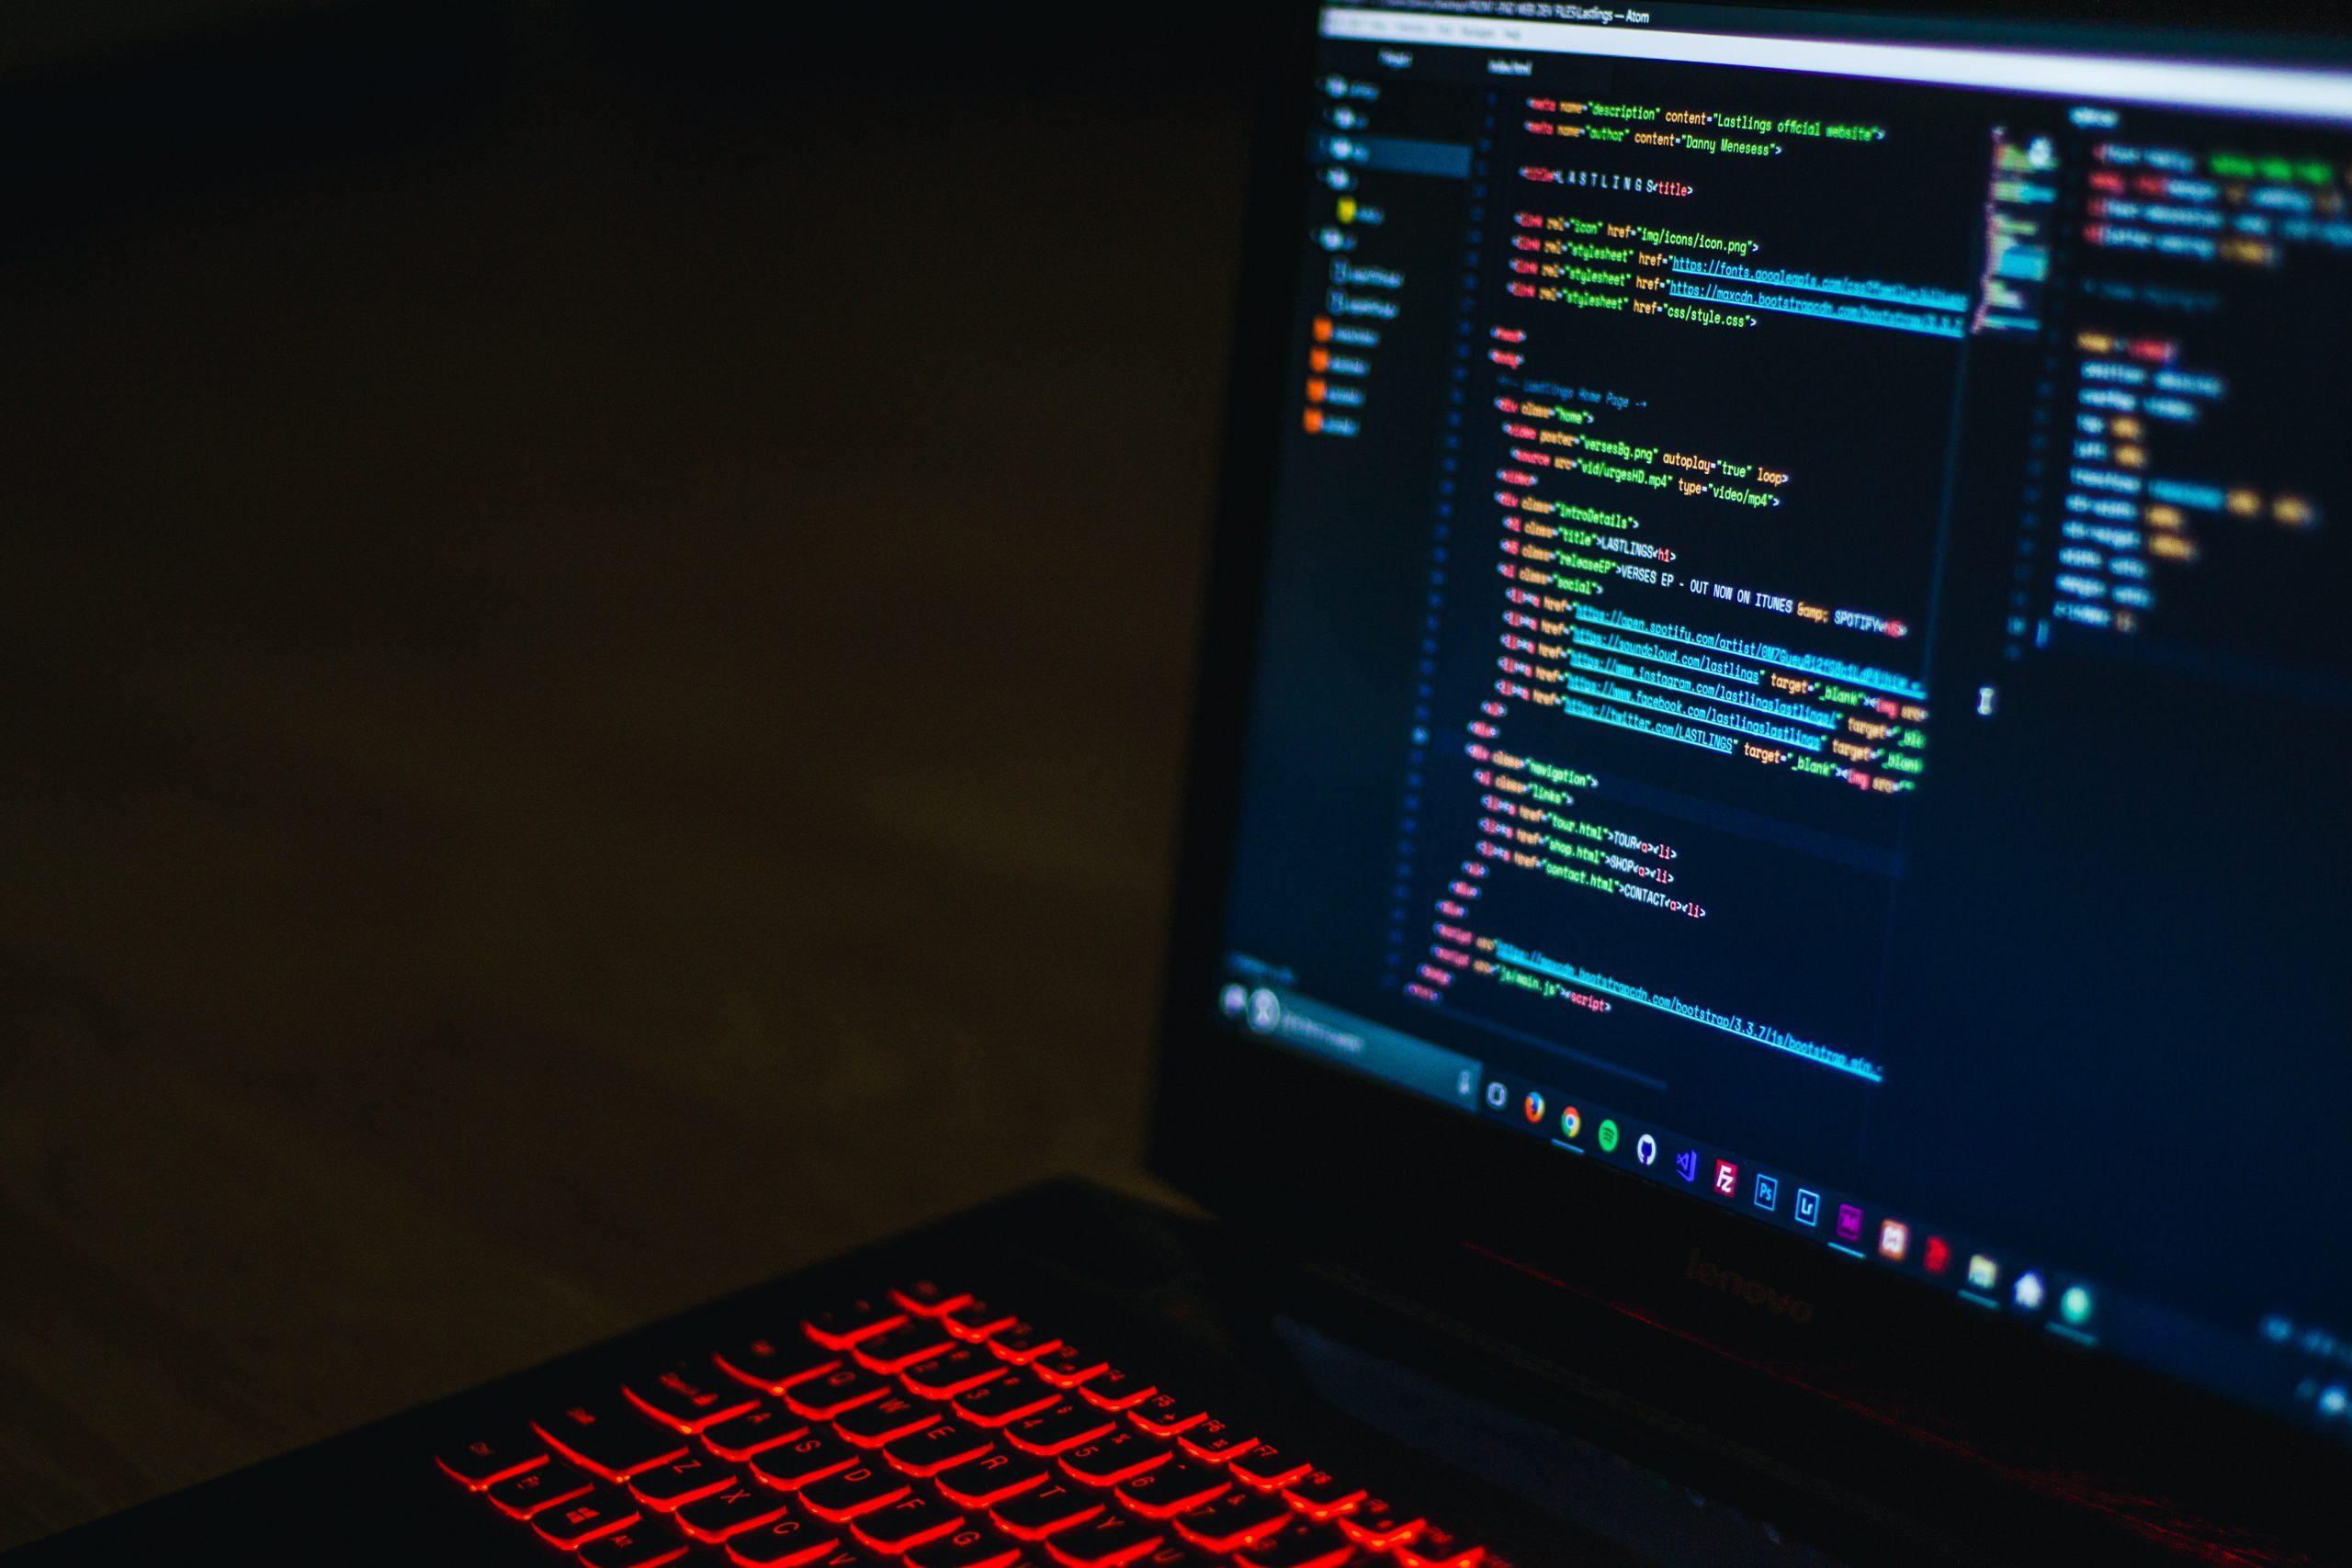 Automate Windows management using scripts